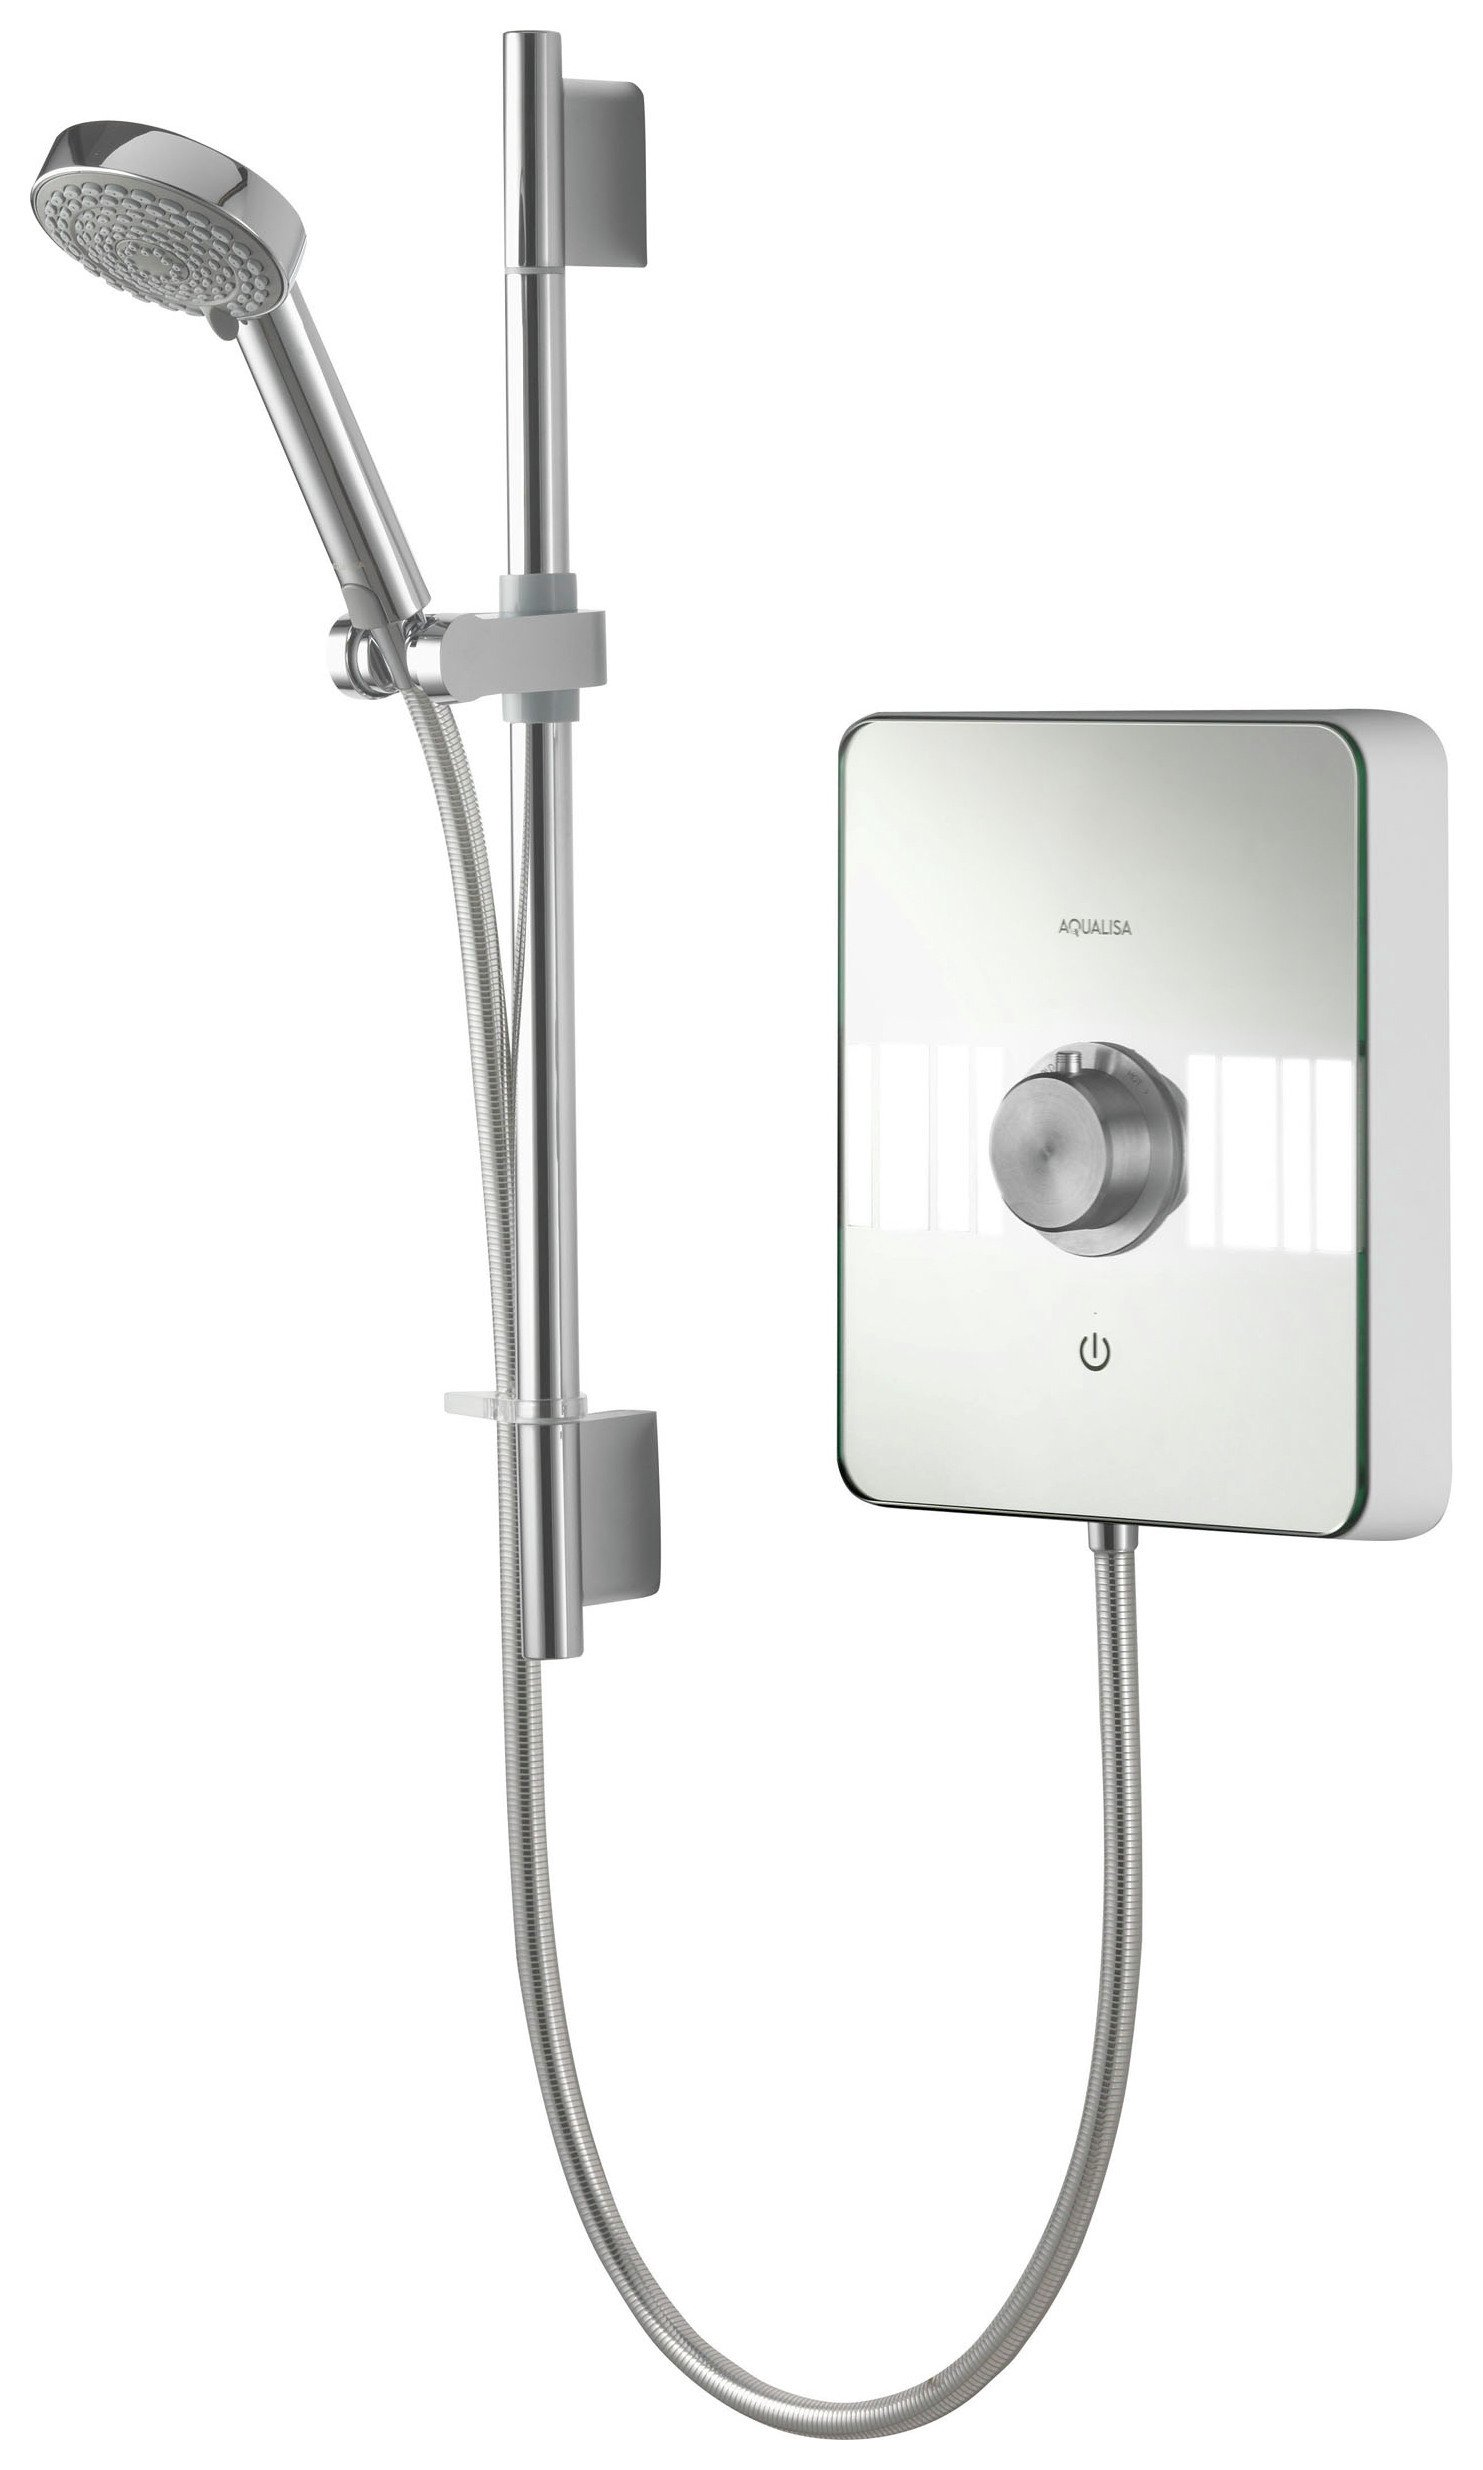 Image of Aqualisa Lumi 9.5kW Electric Shower - Chrome